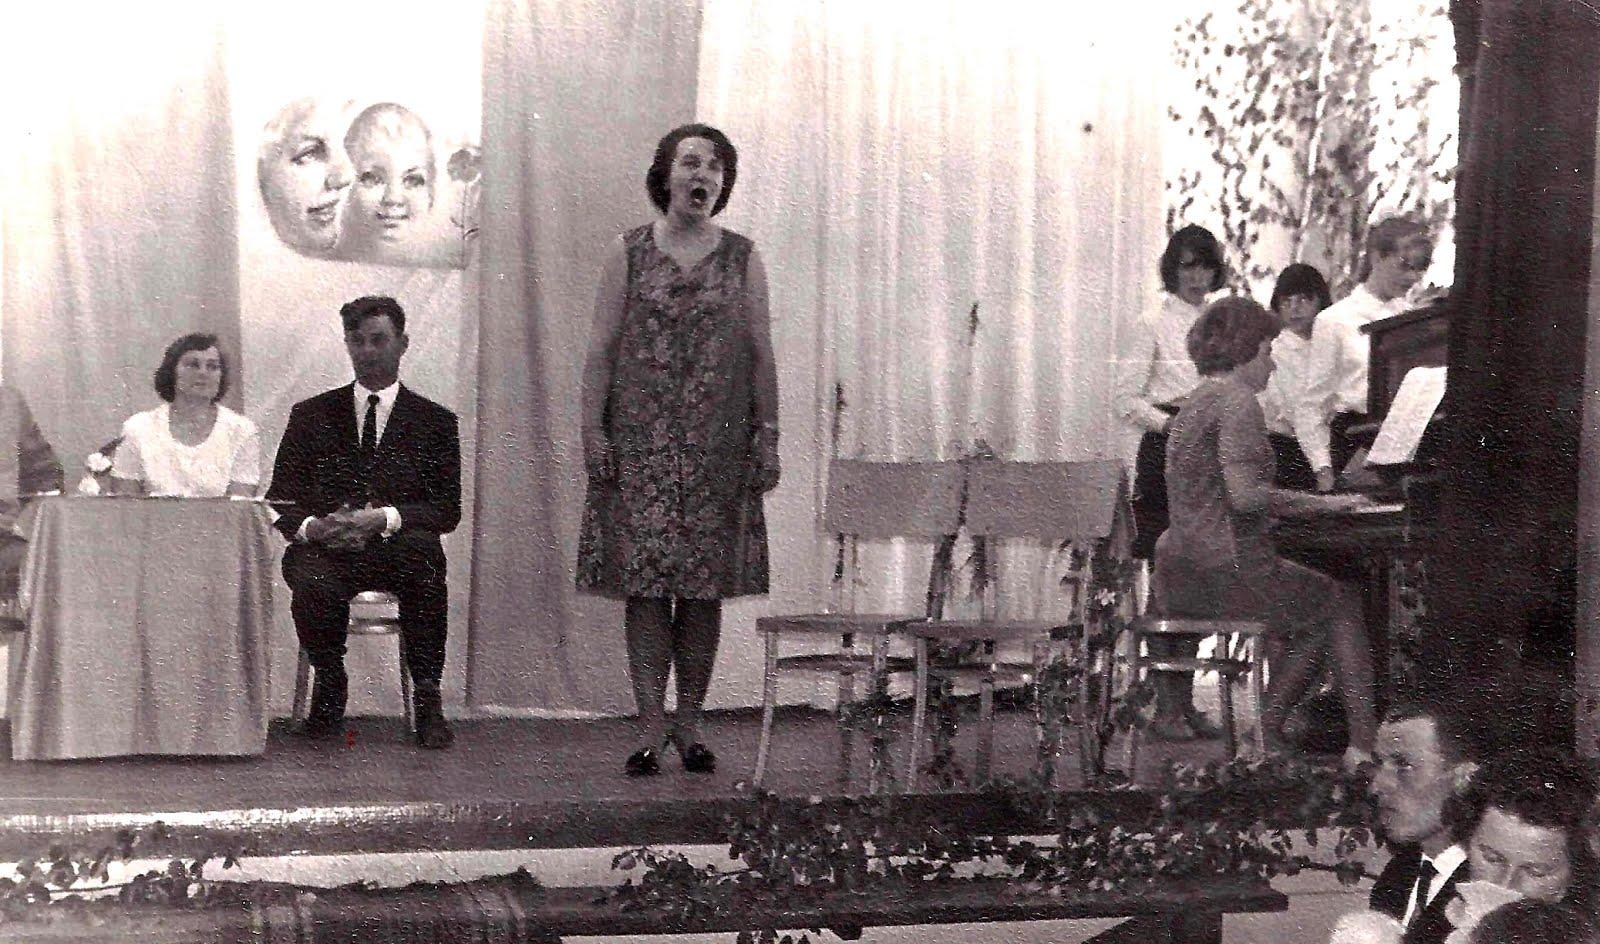 Pasākums tautas namā 1960-tie gadi